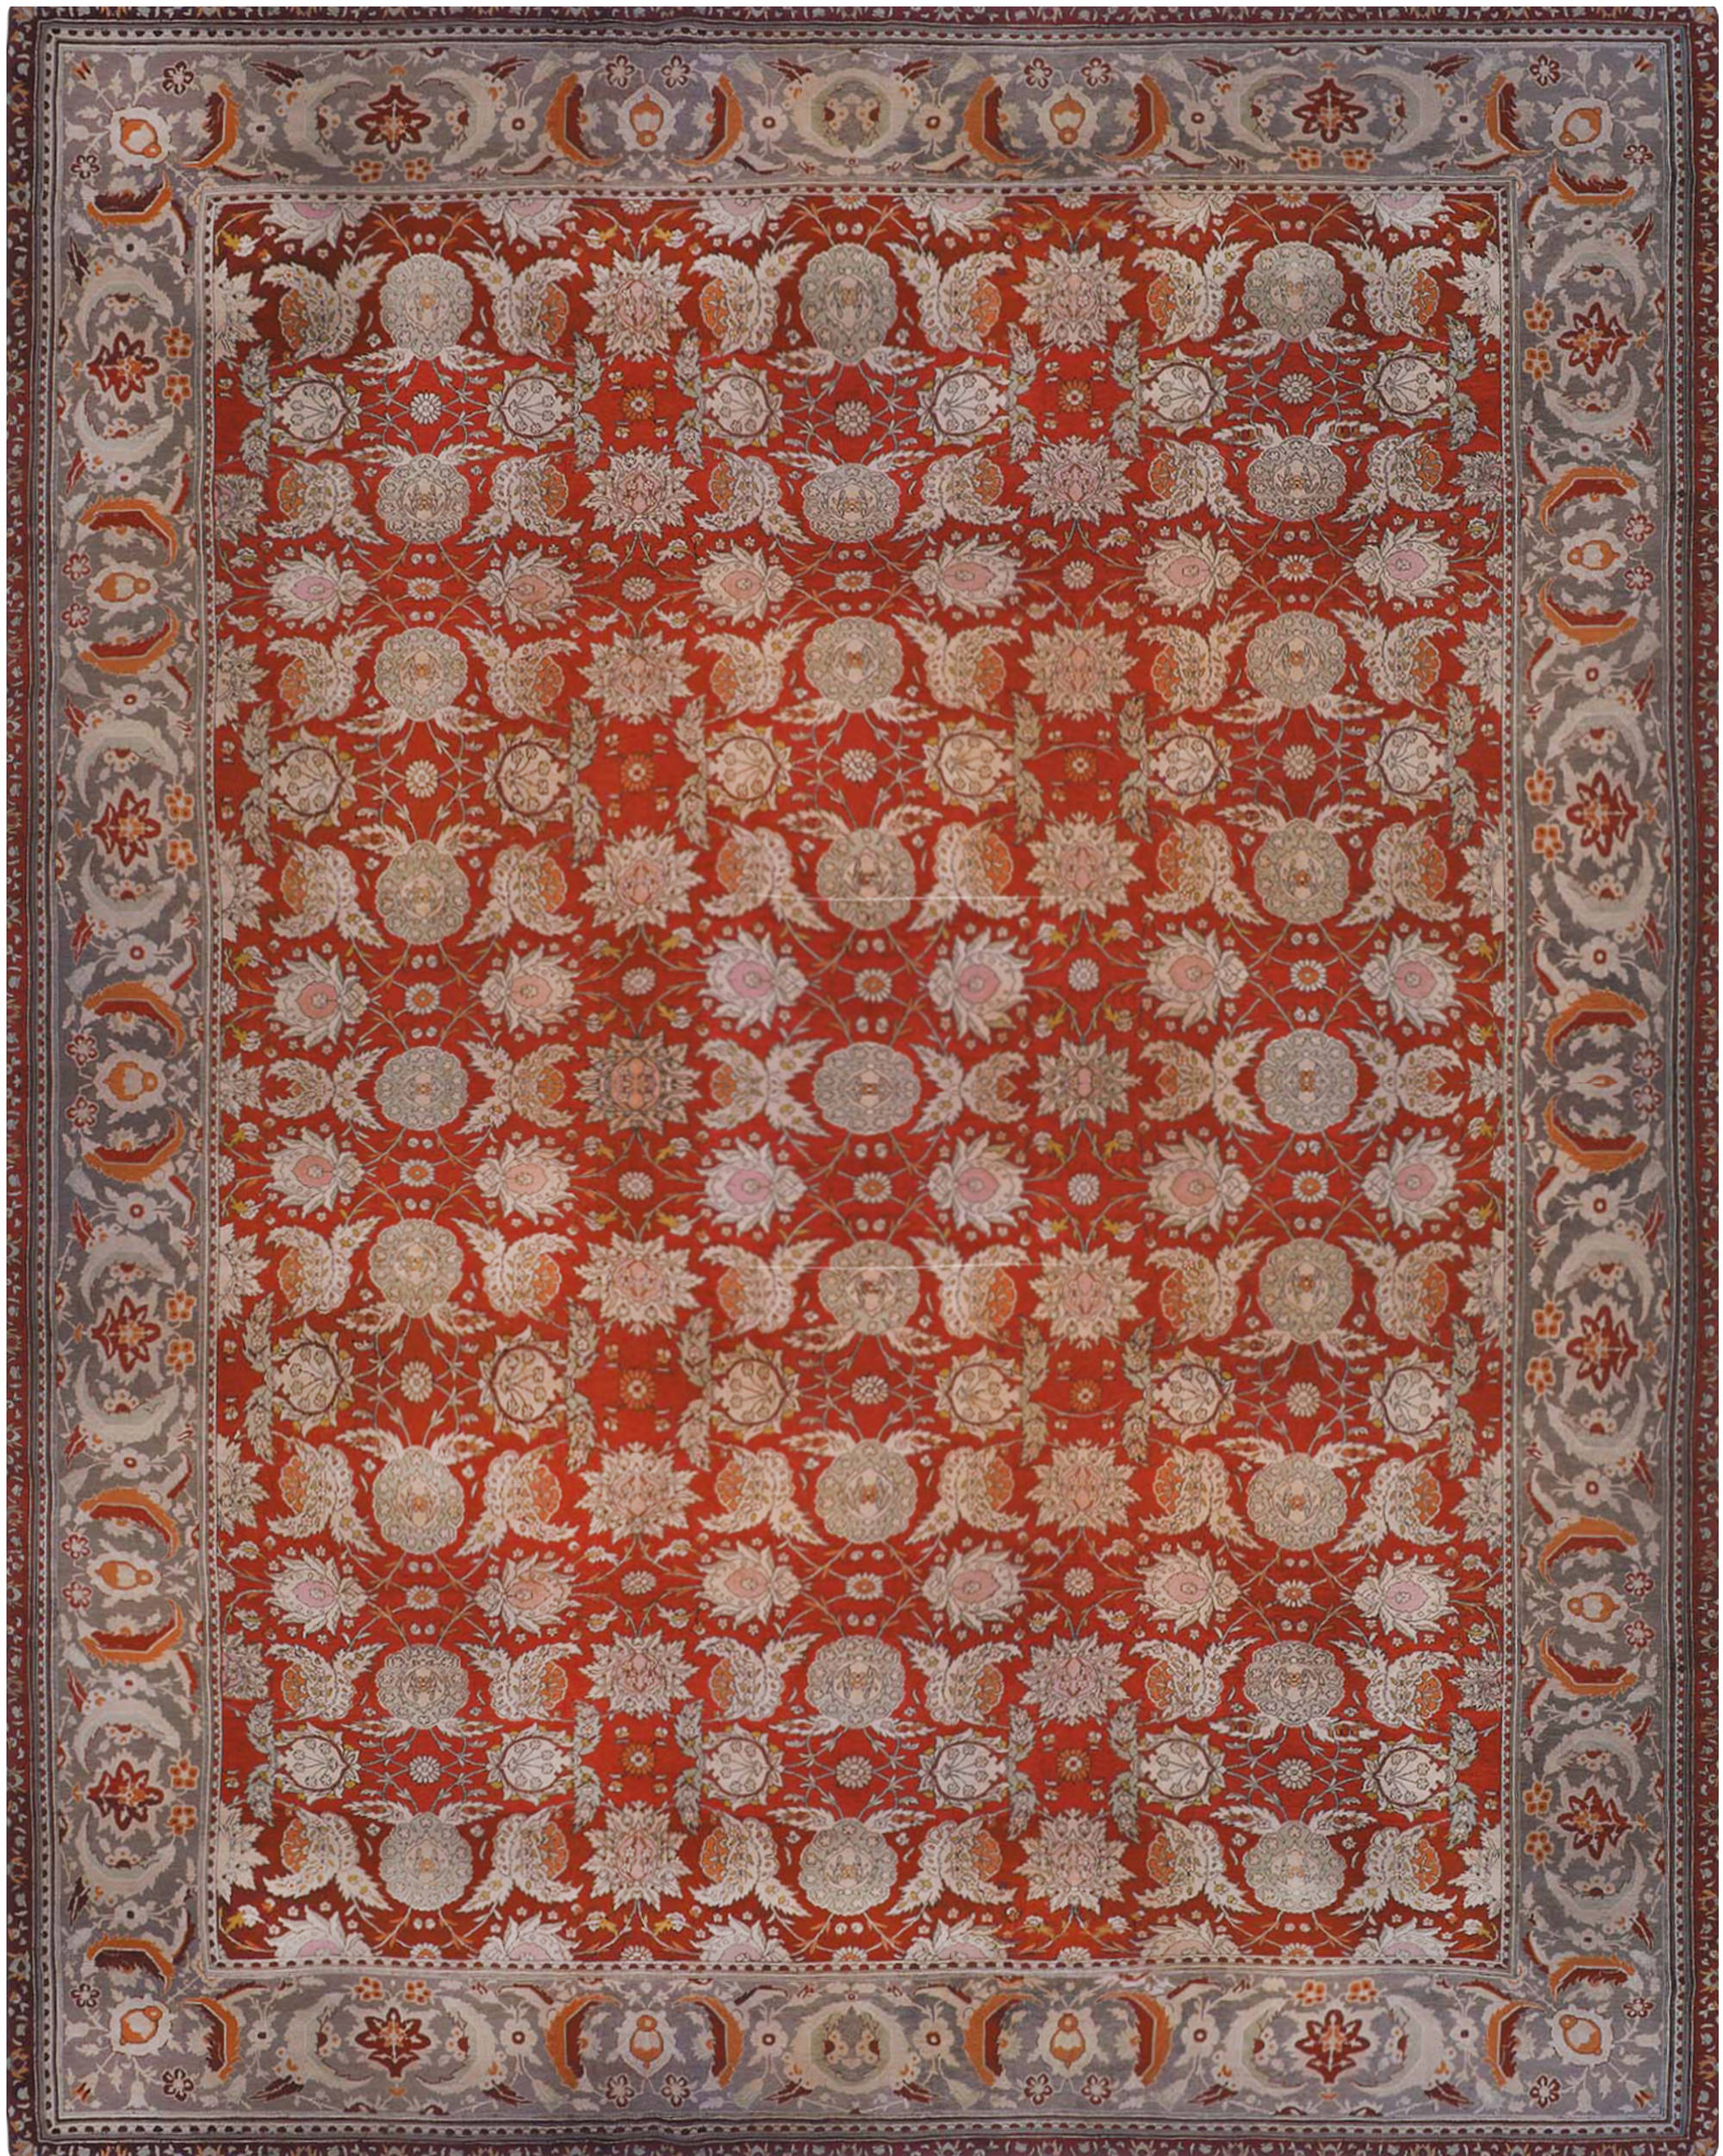 19th Century Turkish Hereke Red Handwoven Wool Carpet BB6684